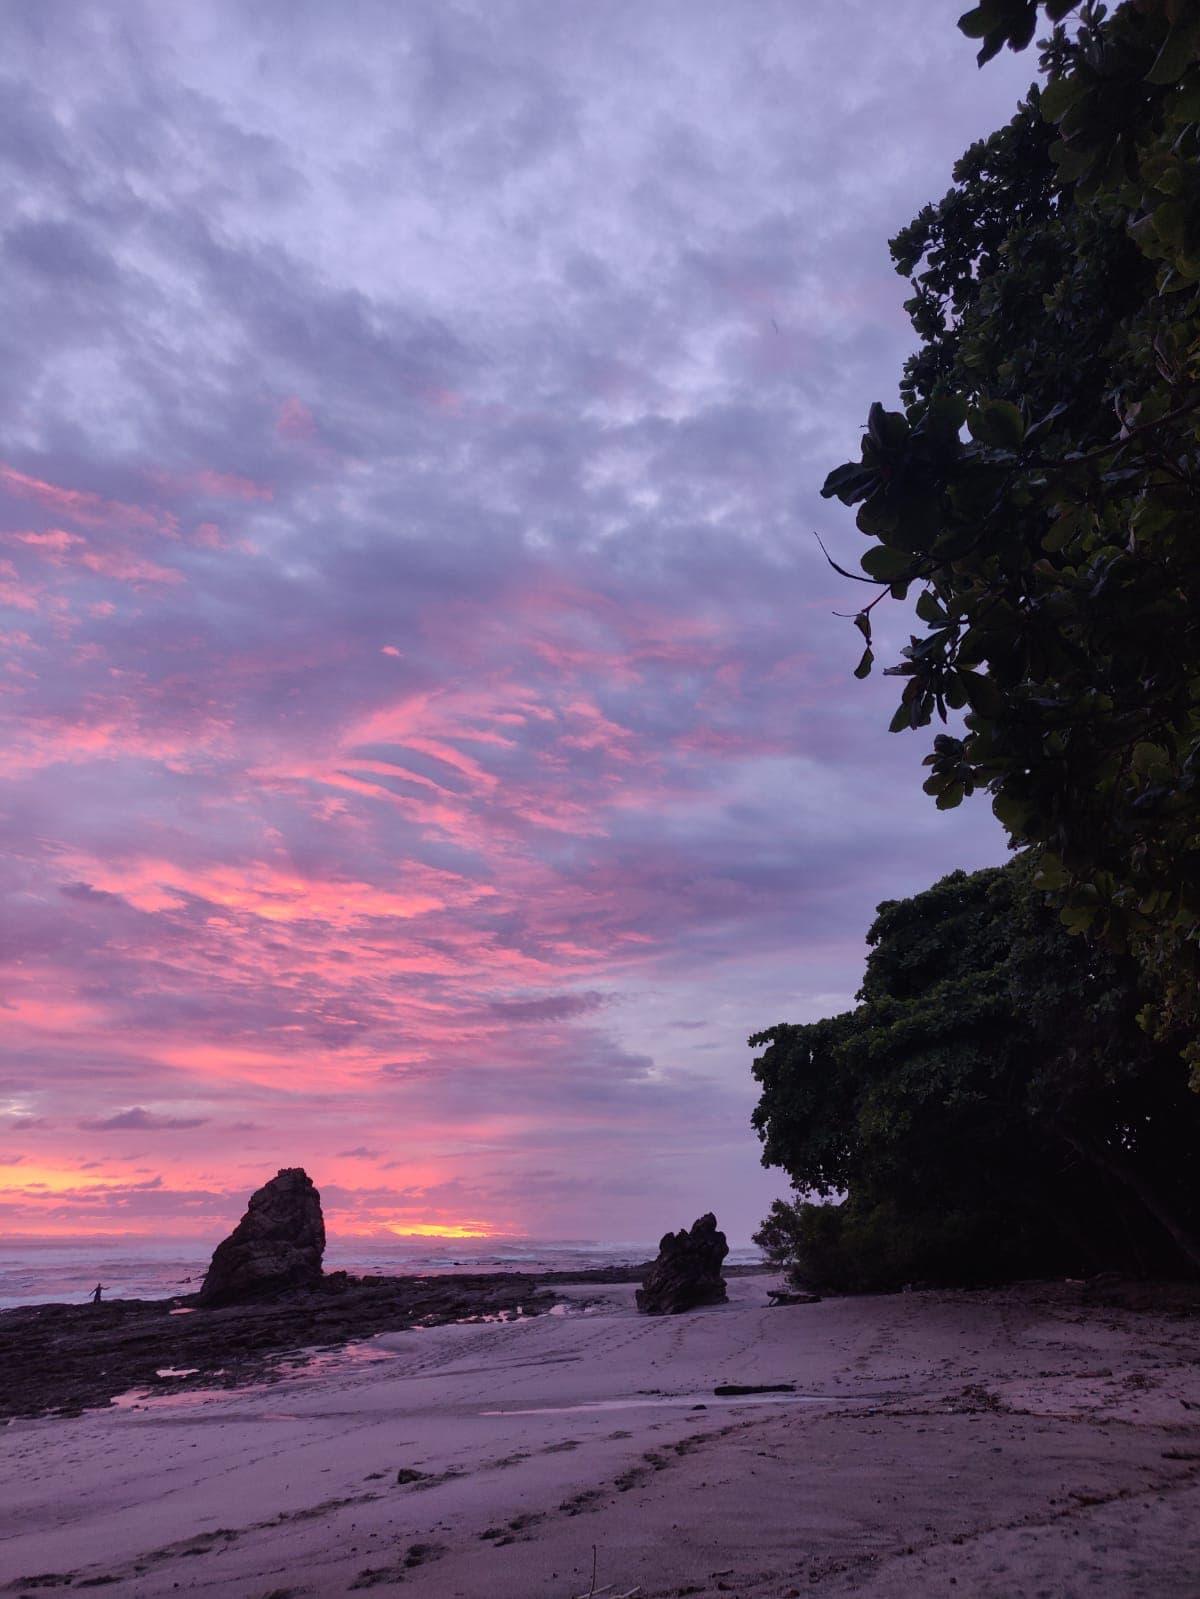 Sonnenuntergang in Santa Teresa, Costa Rica